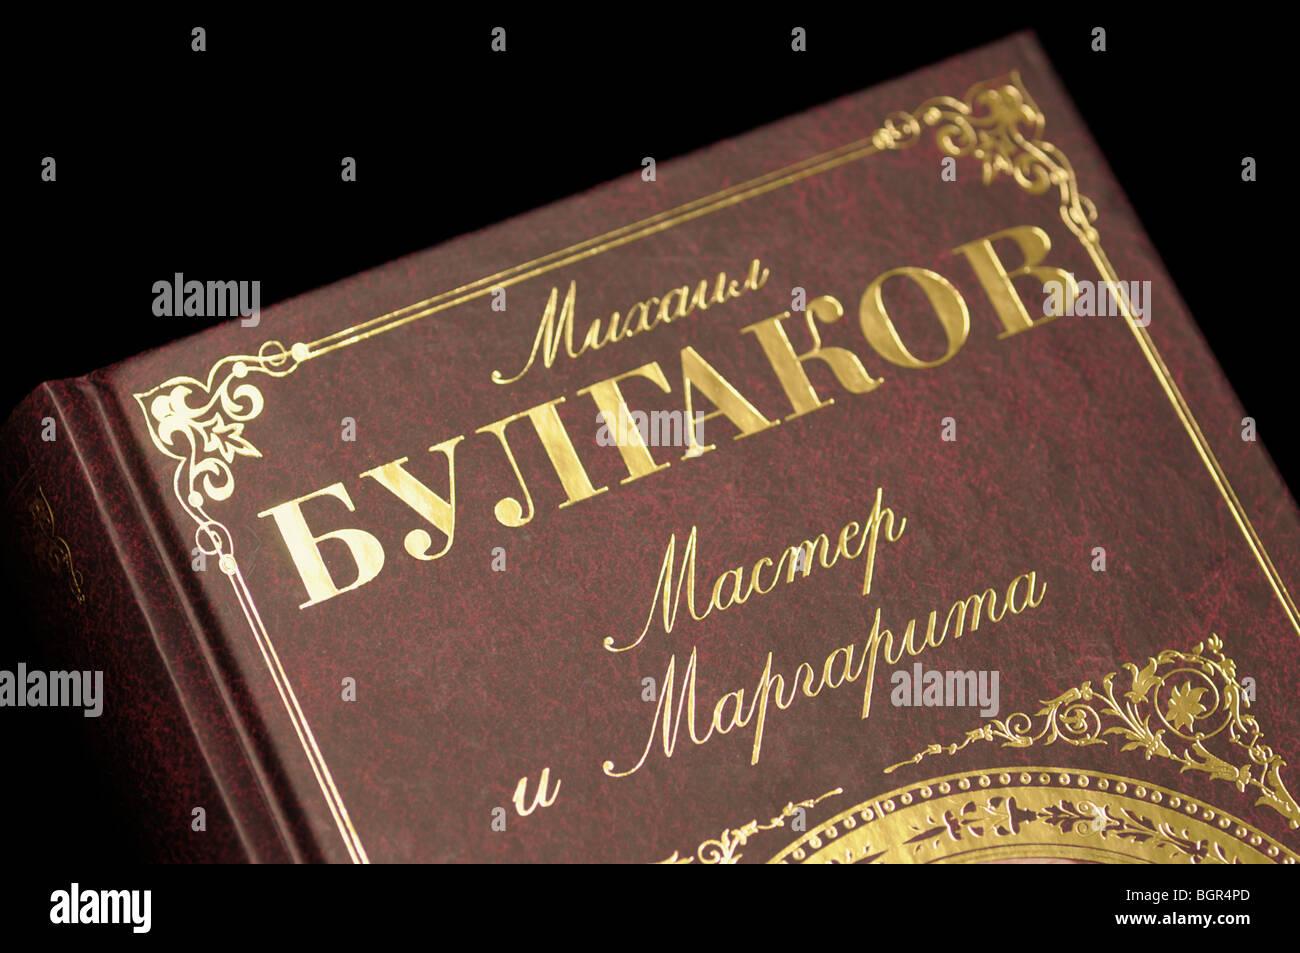 Master and Margarita Book - Author M. Bulgakov - Stock Image